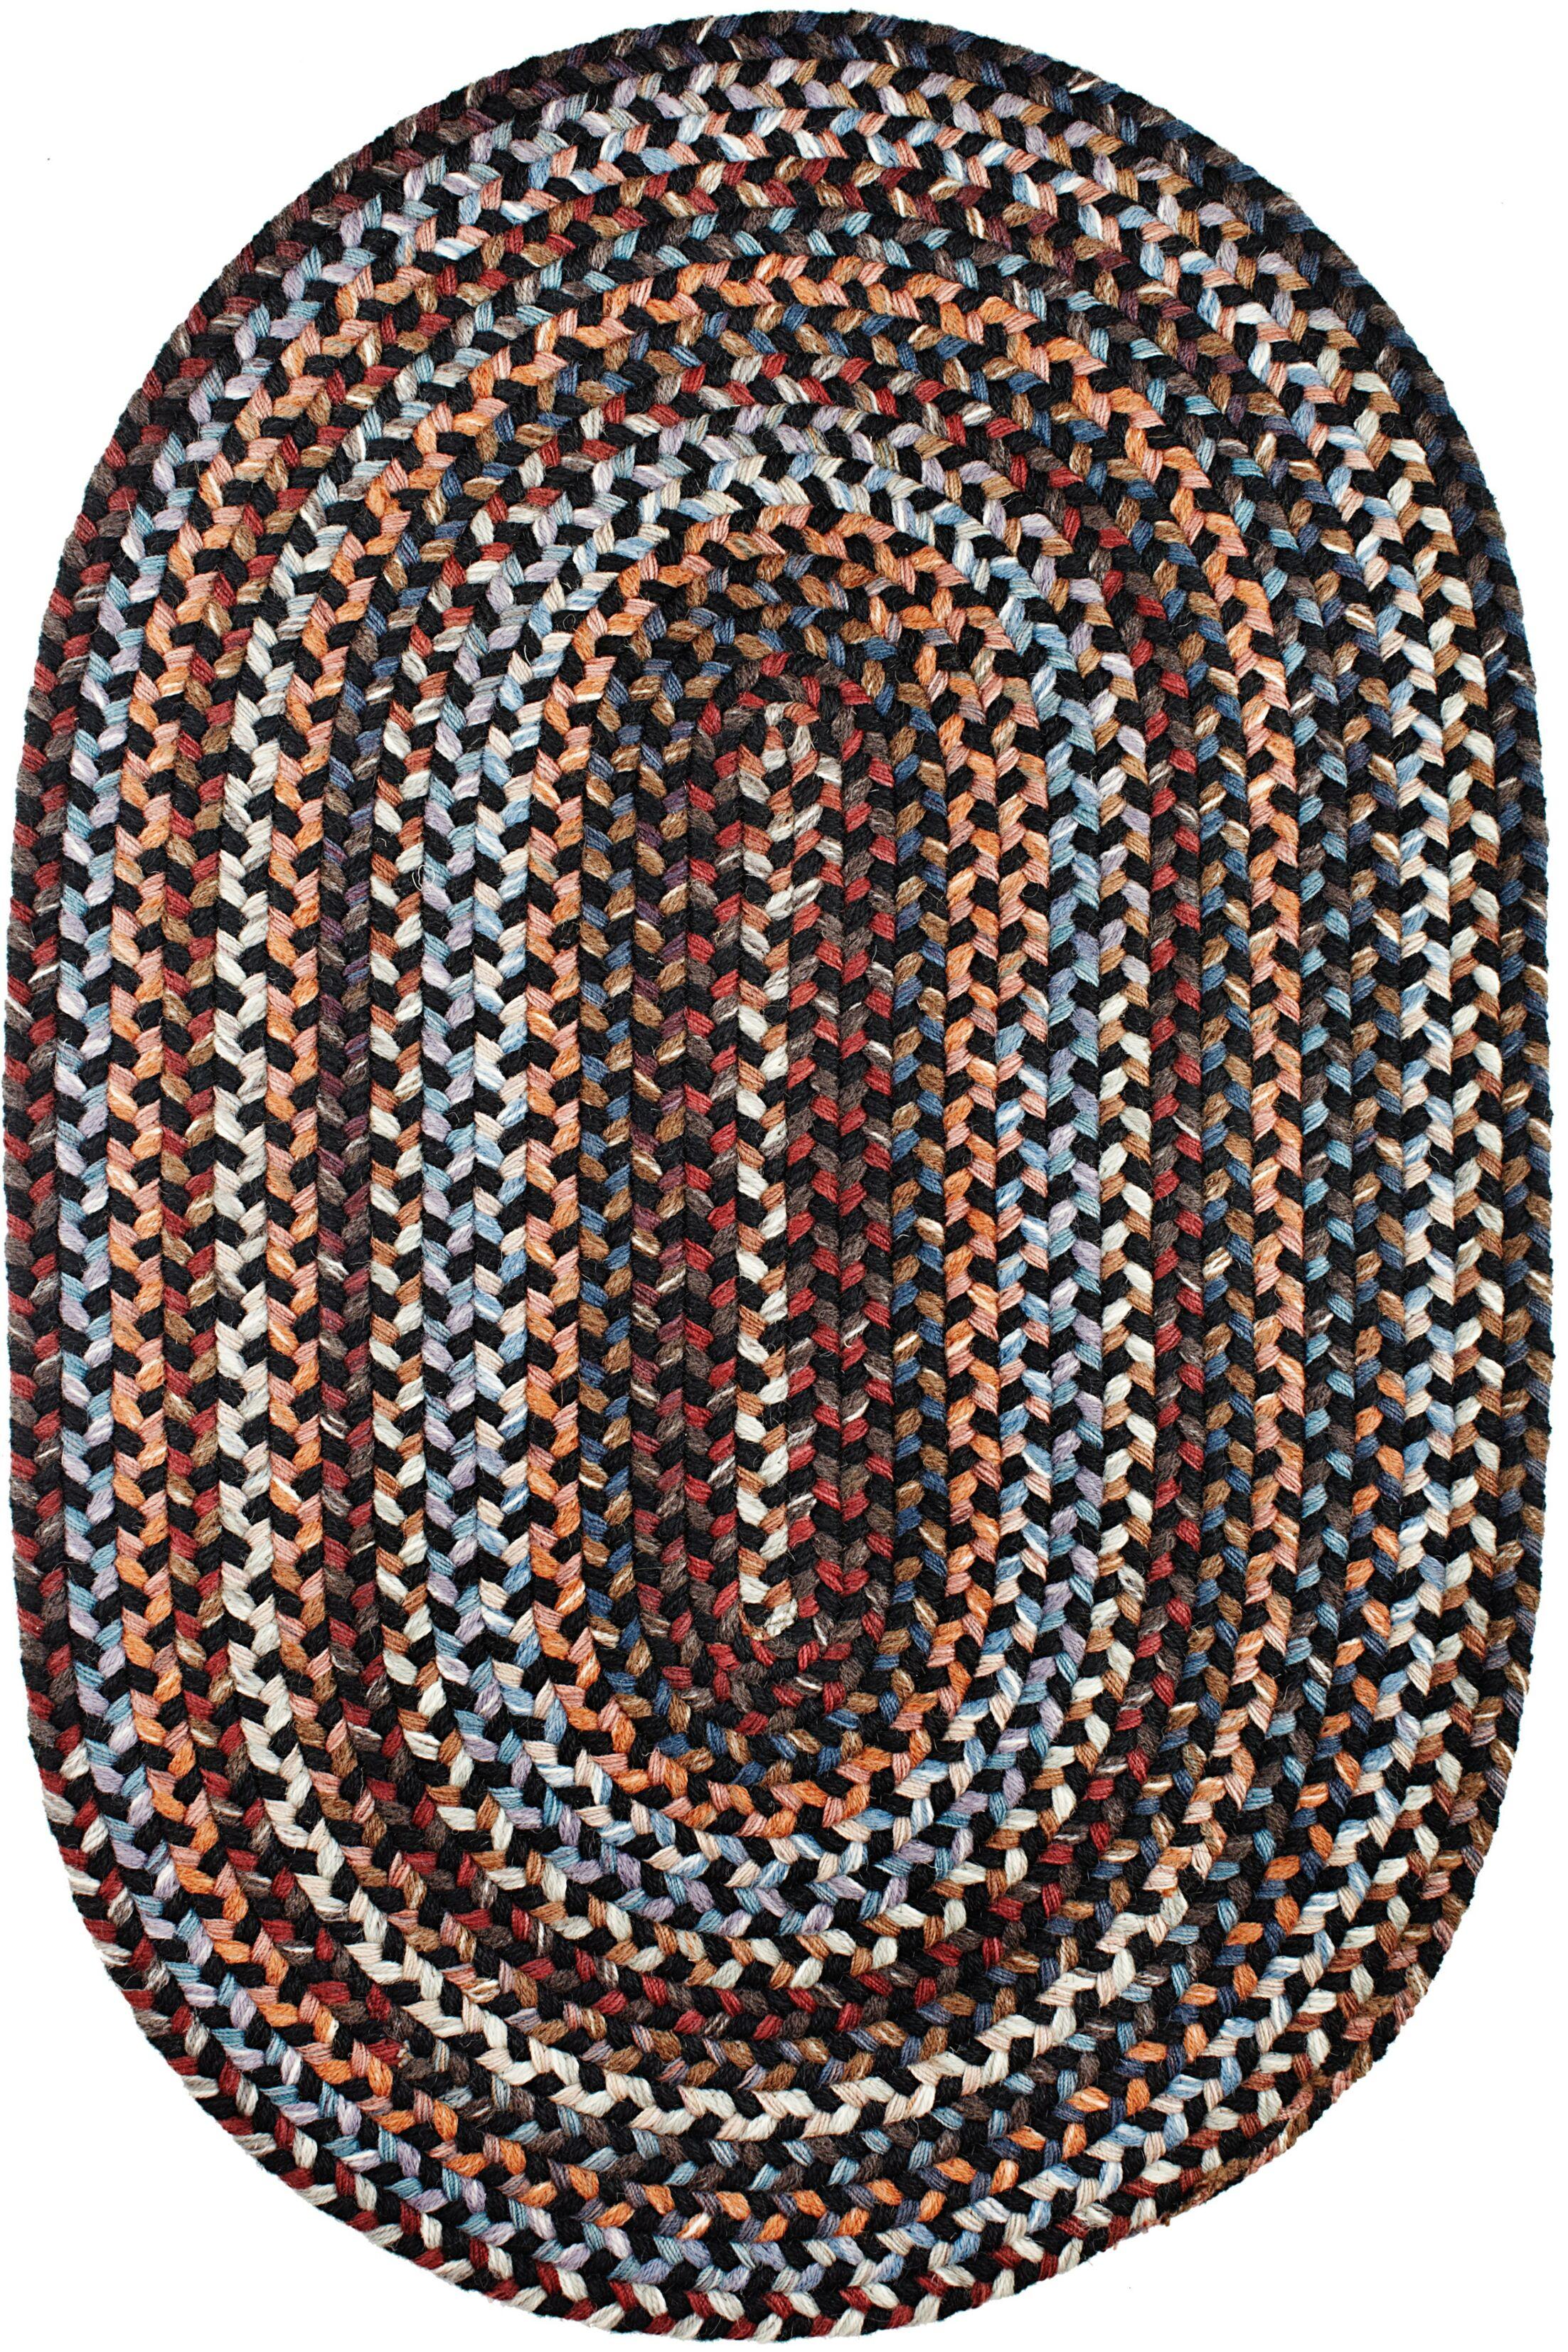 Handmade Black Area Rug Rug Size: Oval 7' x 9'